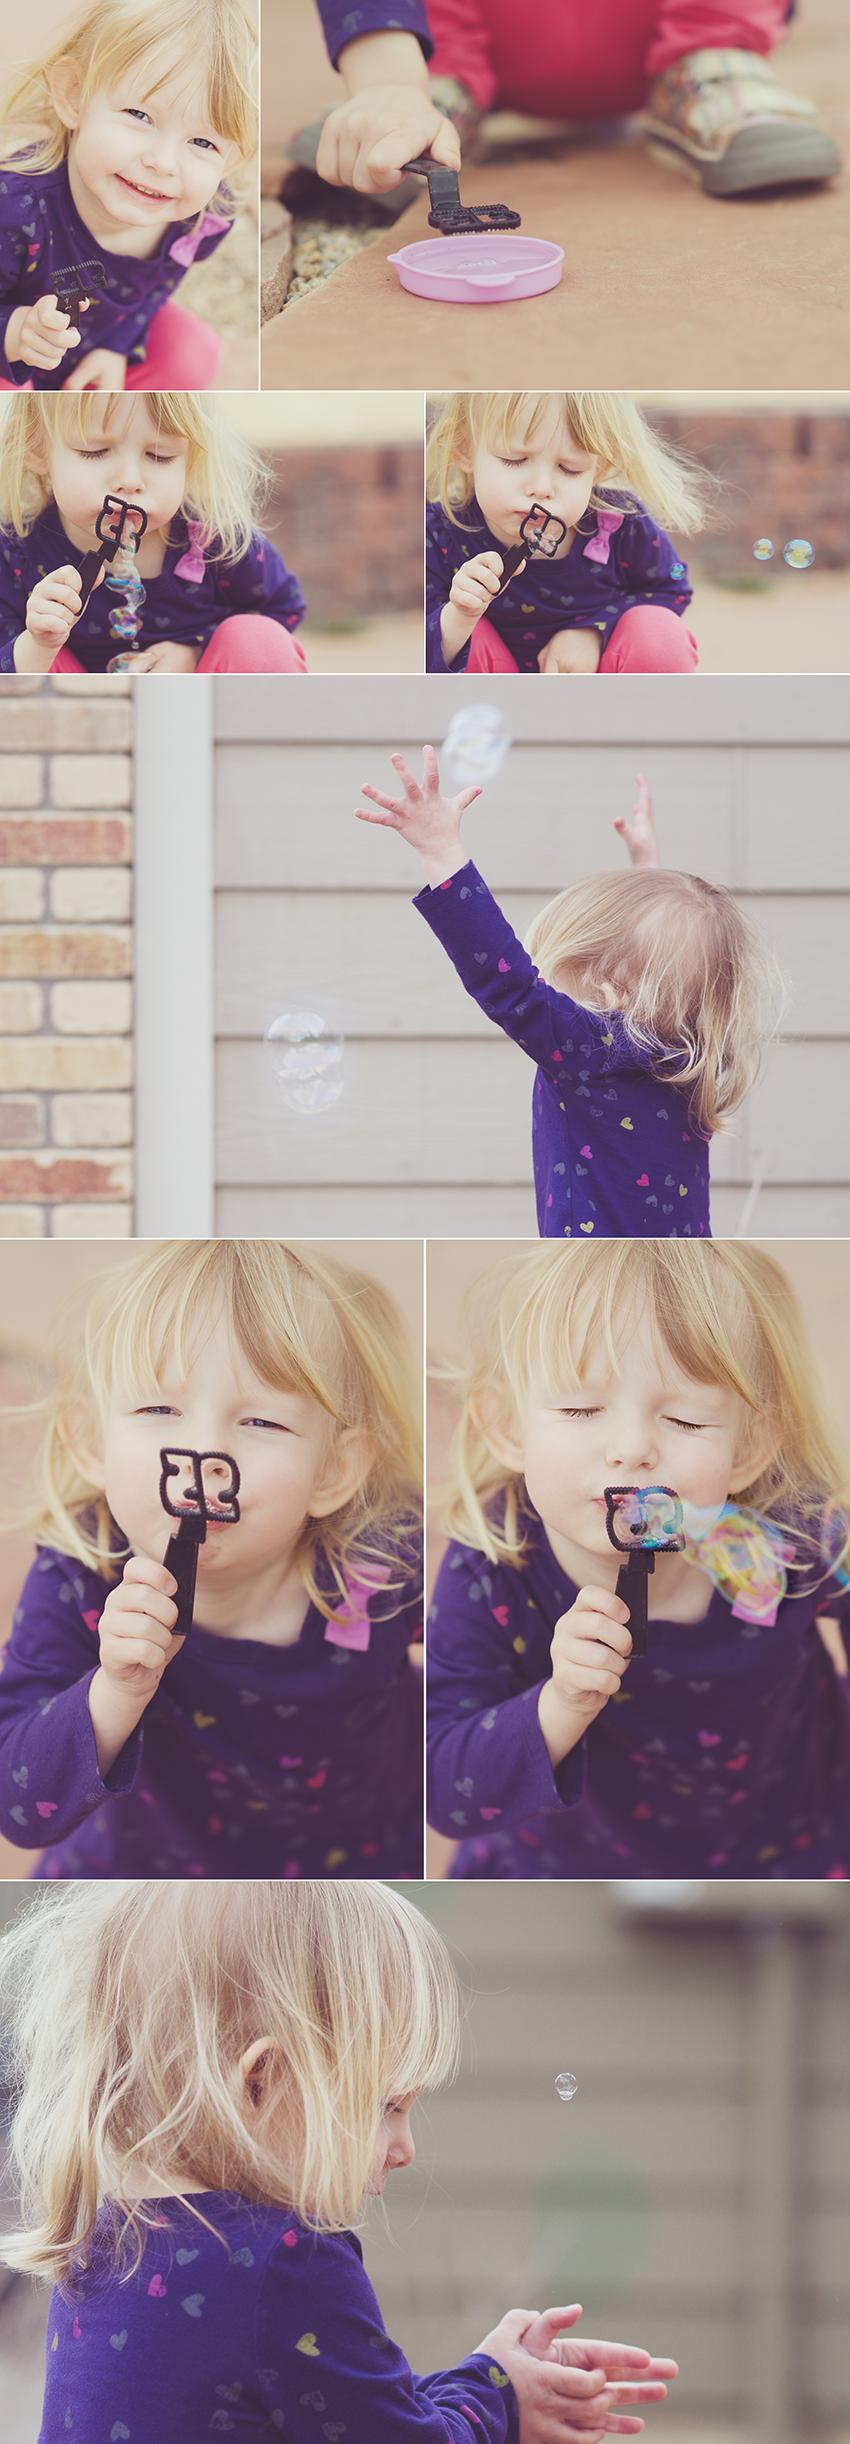 Ft-Collins-Child-Photographer